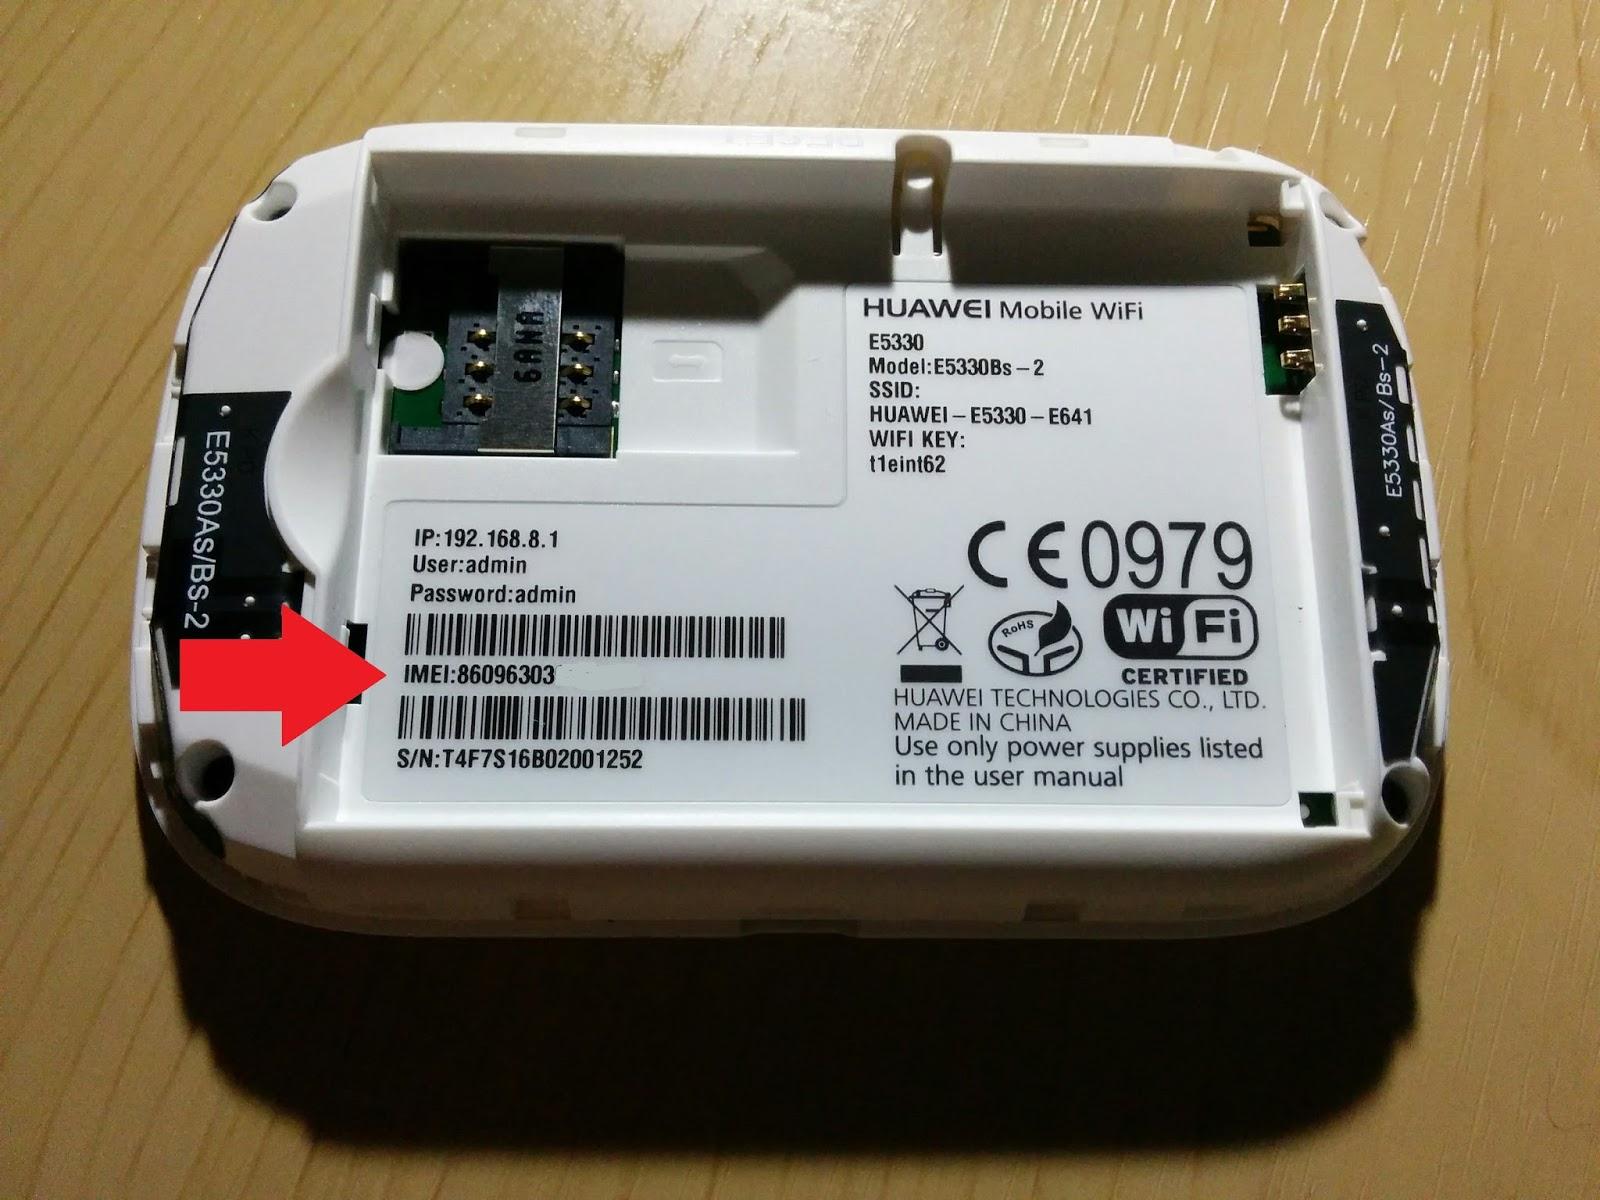 Crazy Panda: How to UNLOCK you Huawei Mobile Broadband Router / Modem